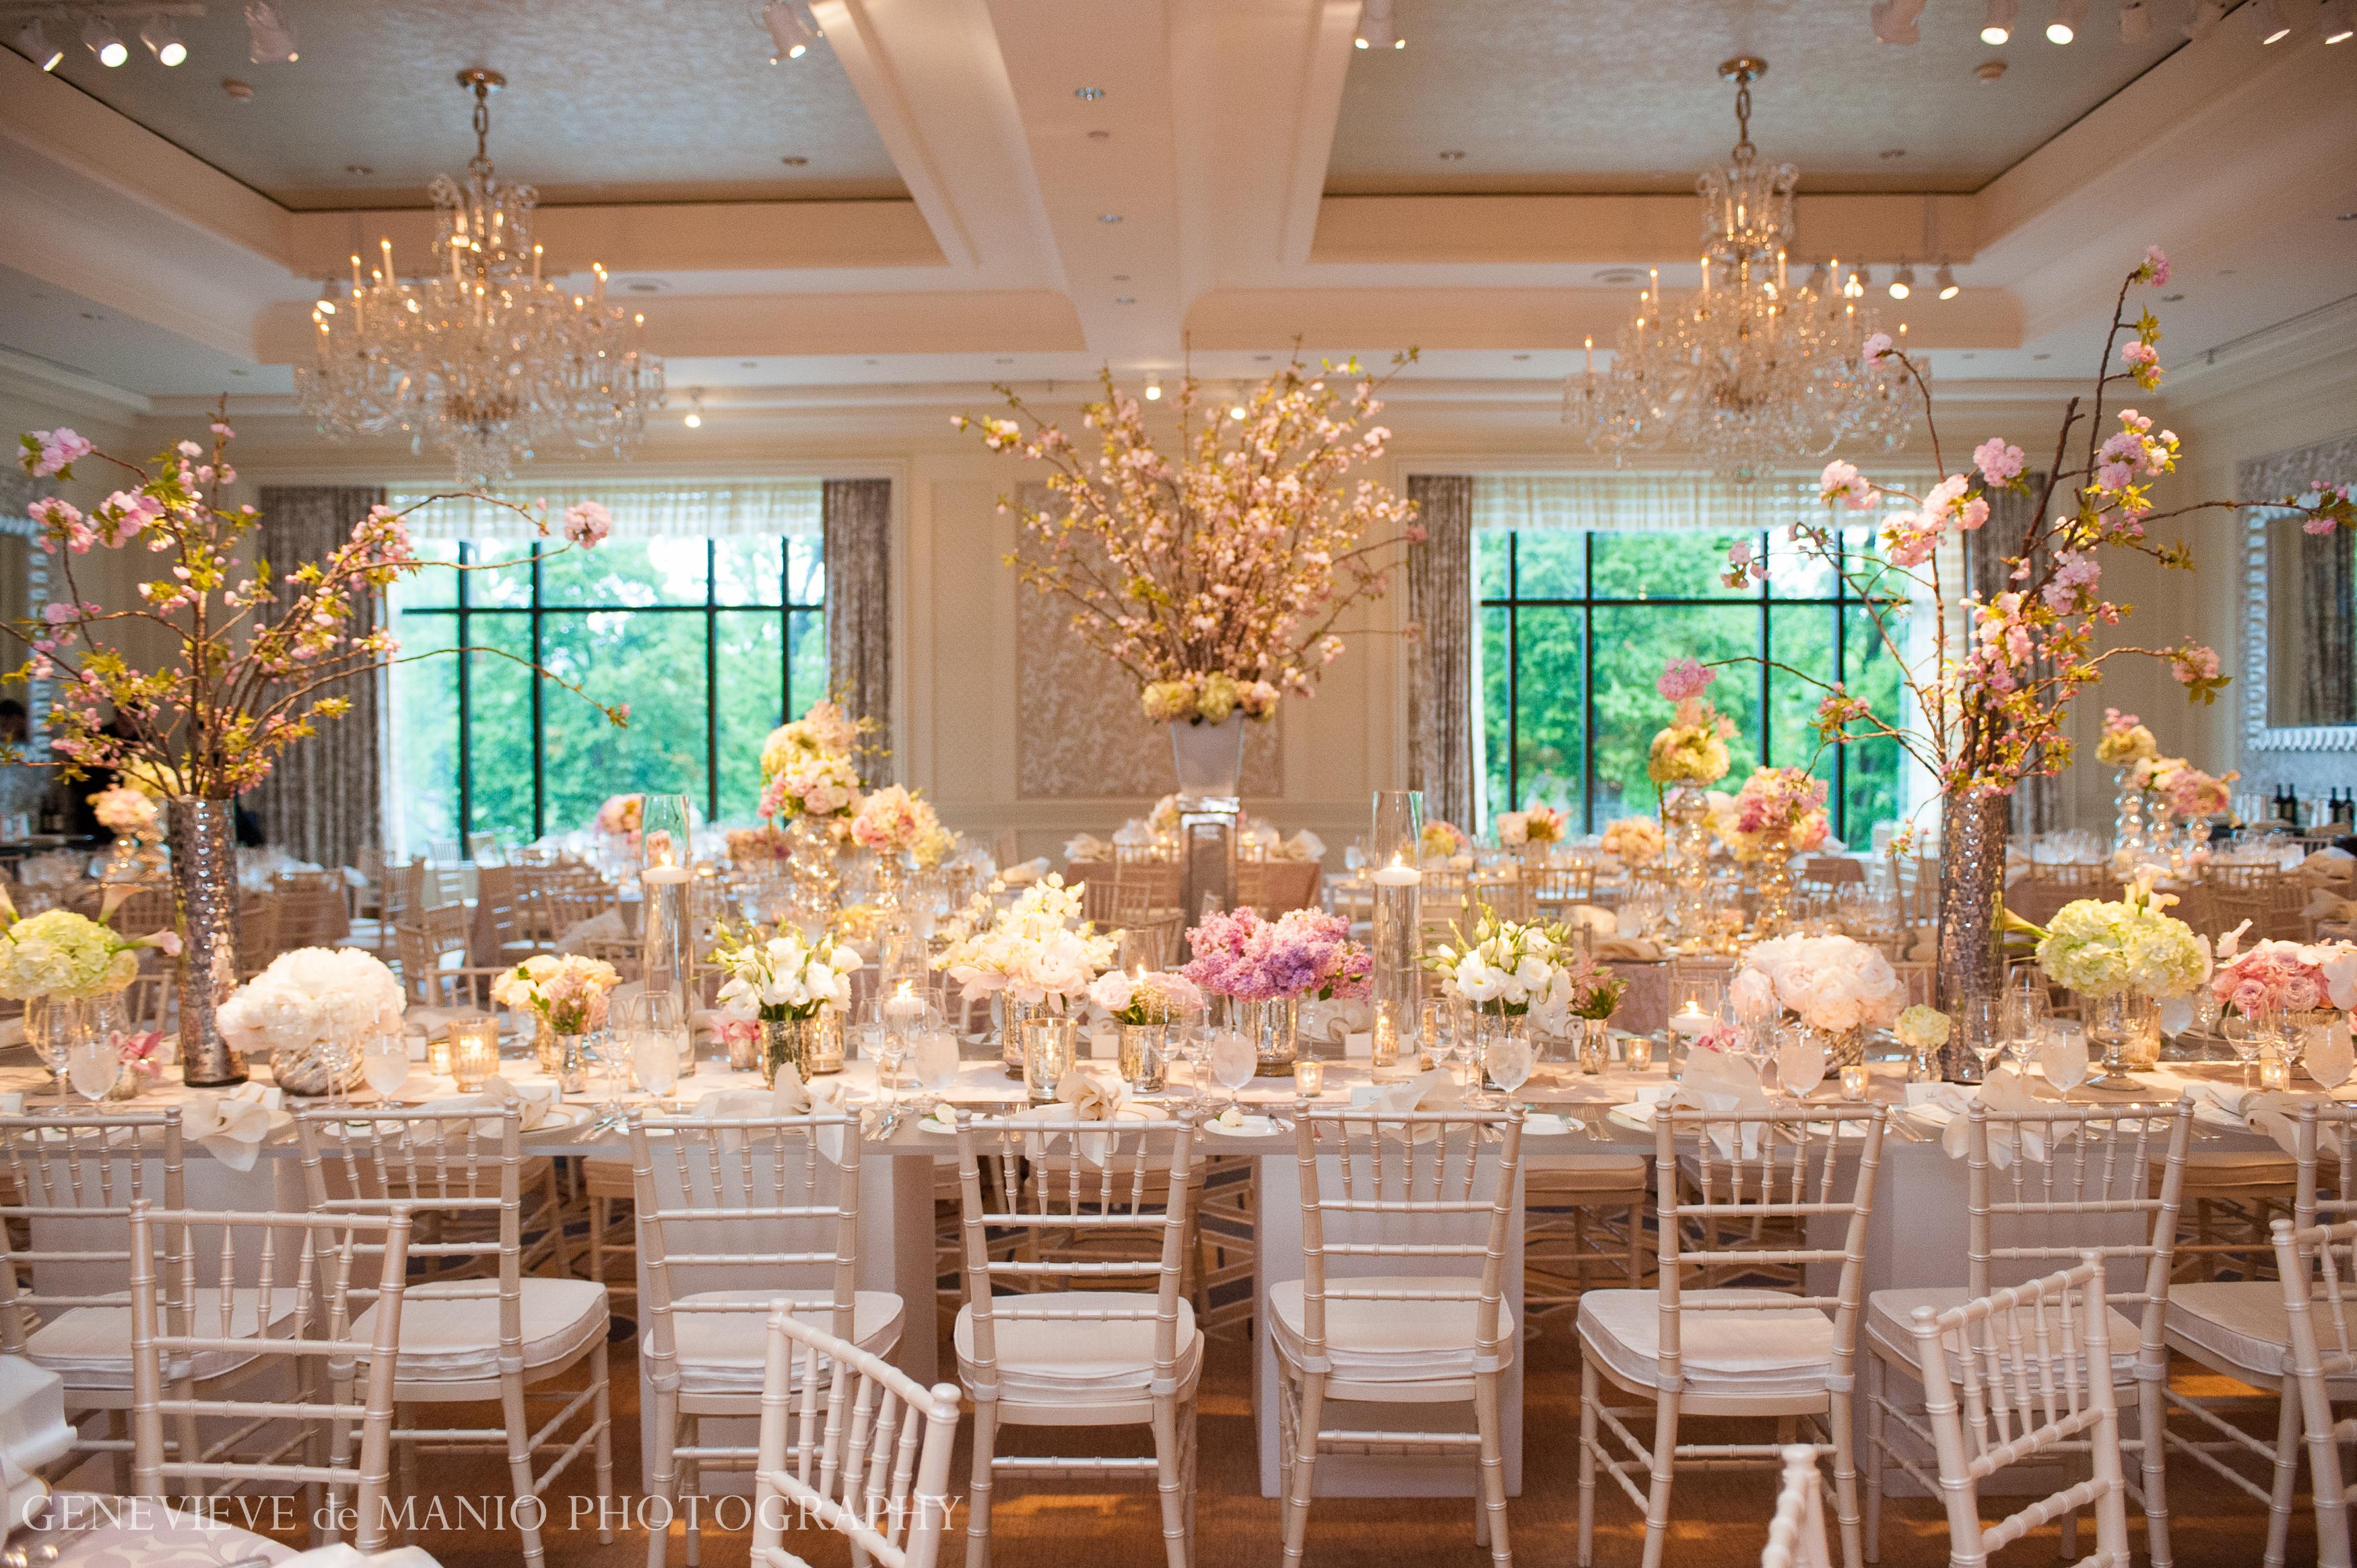 Lovely Ballroom Wedding at the Four Seasons - Suzanne B. Lowell Lighting Design